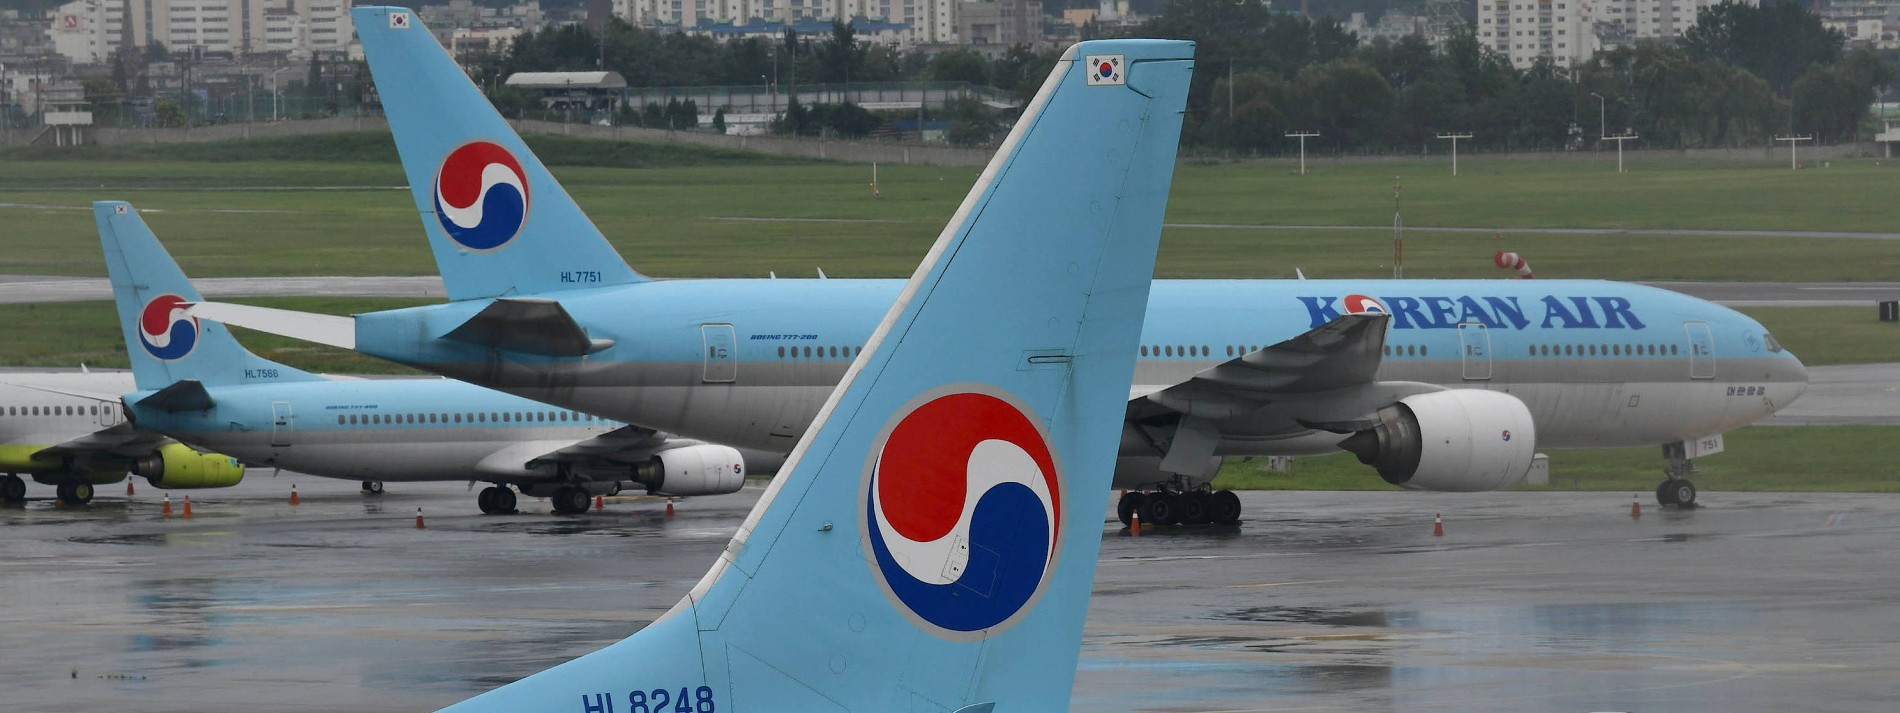 Korean Air will Rivalen Asiana übernehmen